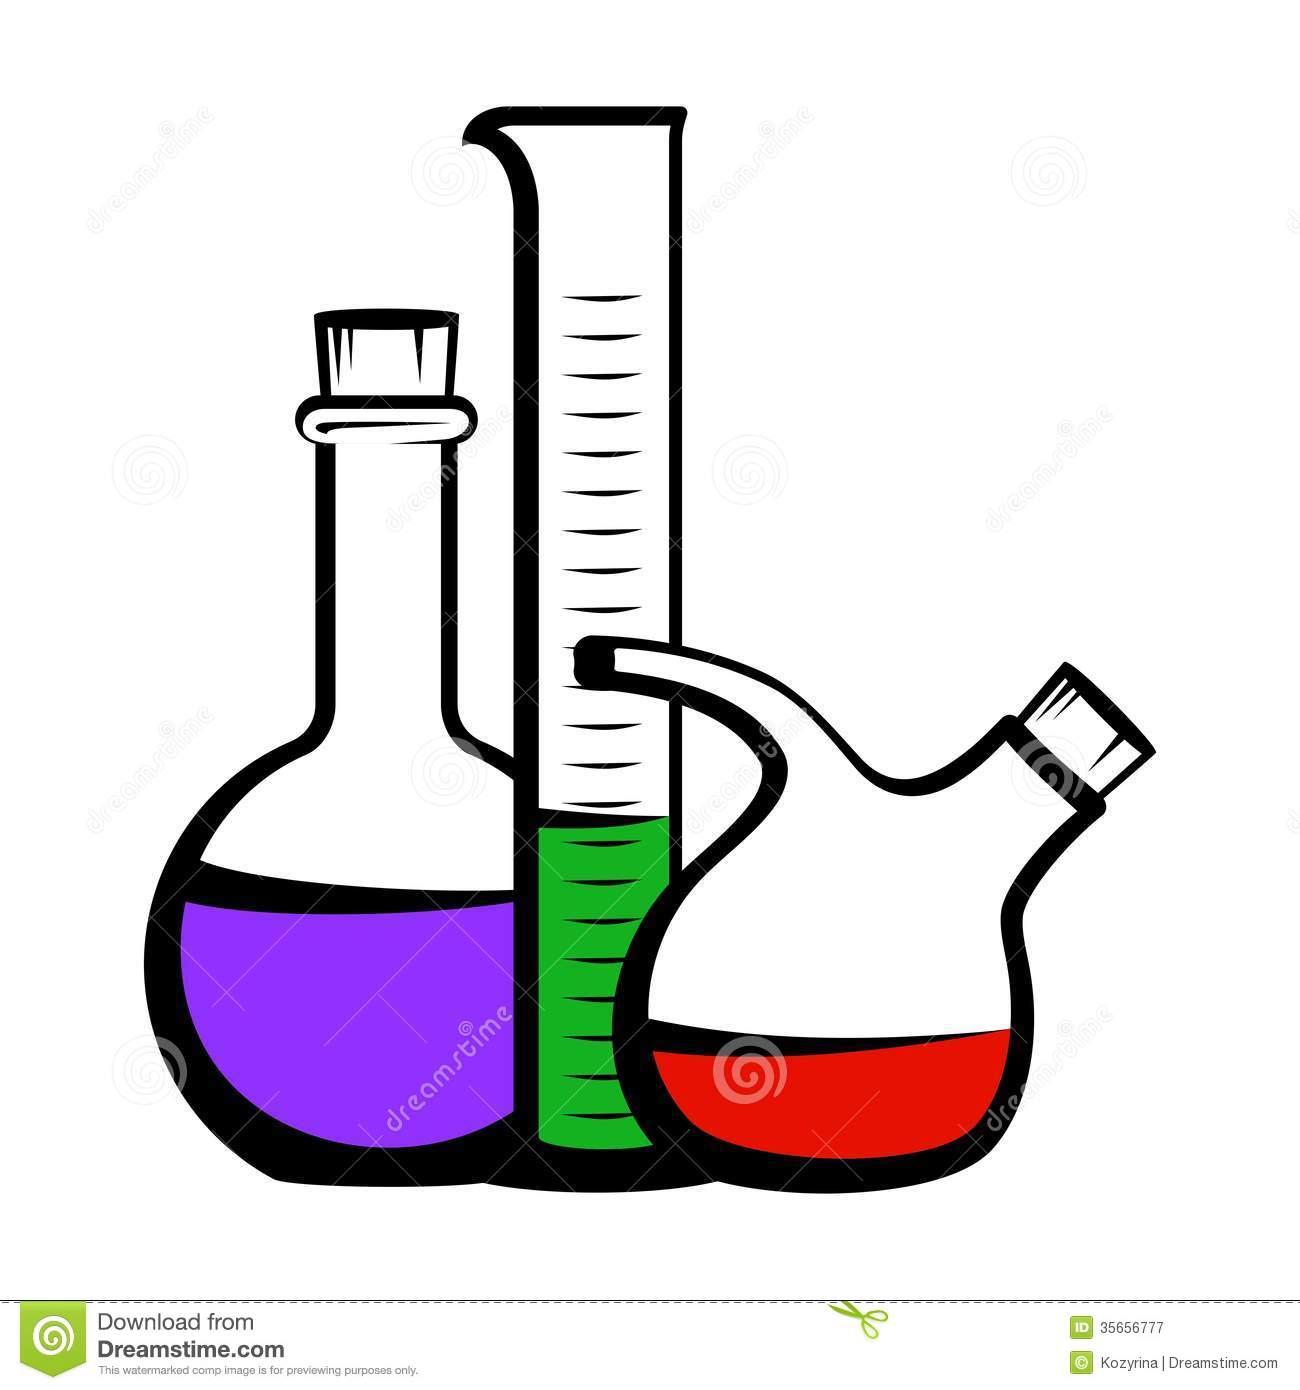 Chemistry clipart logo. Station